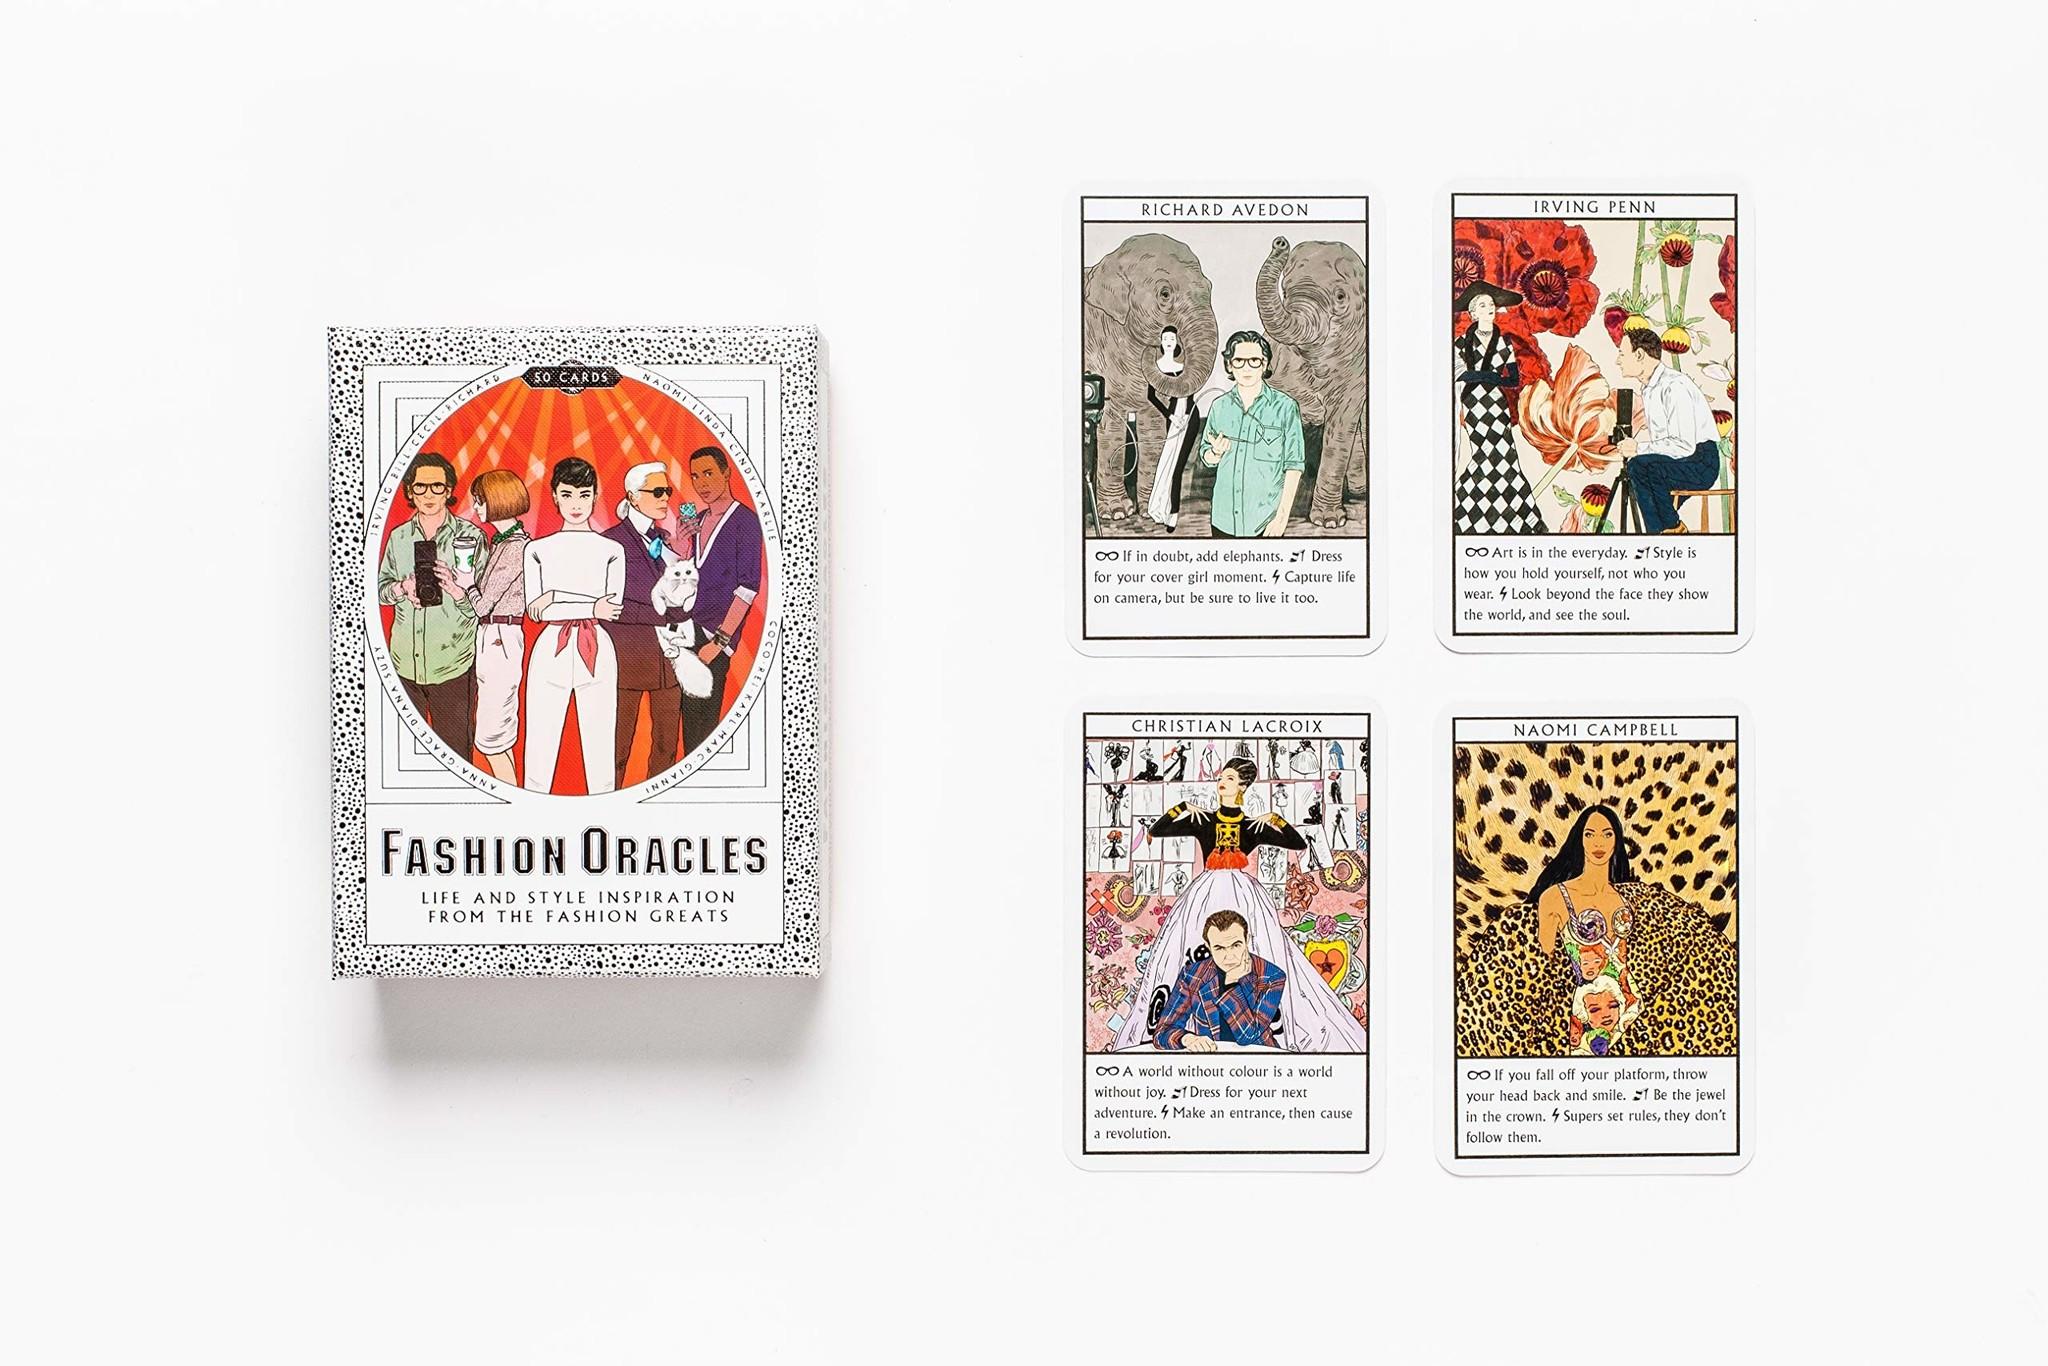 fashion oracles-3